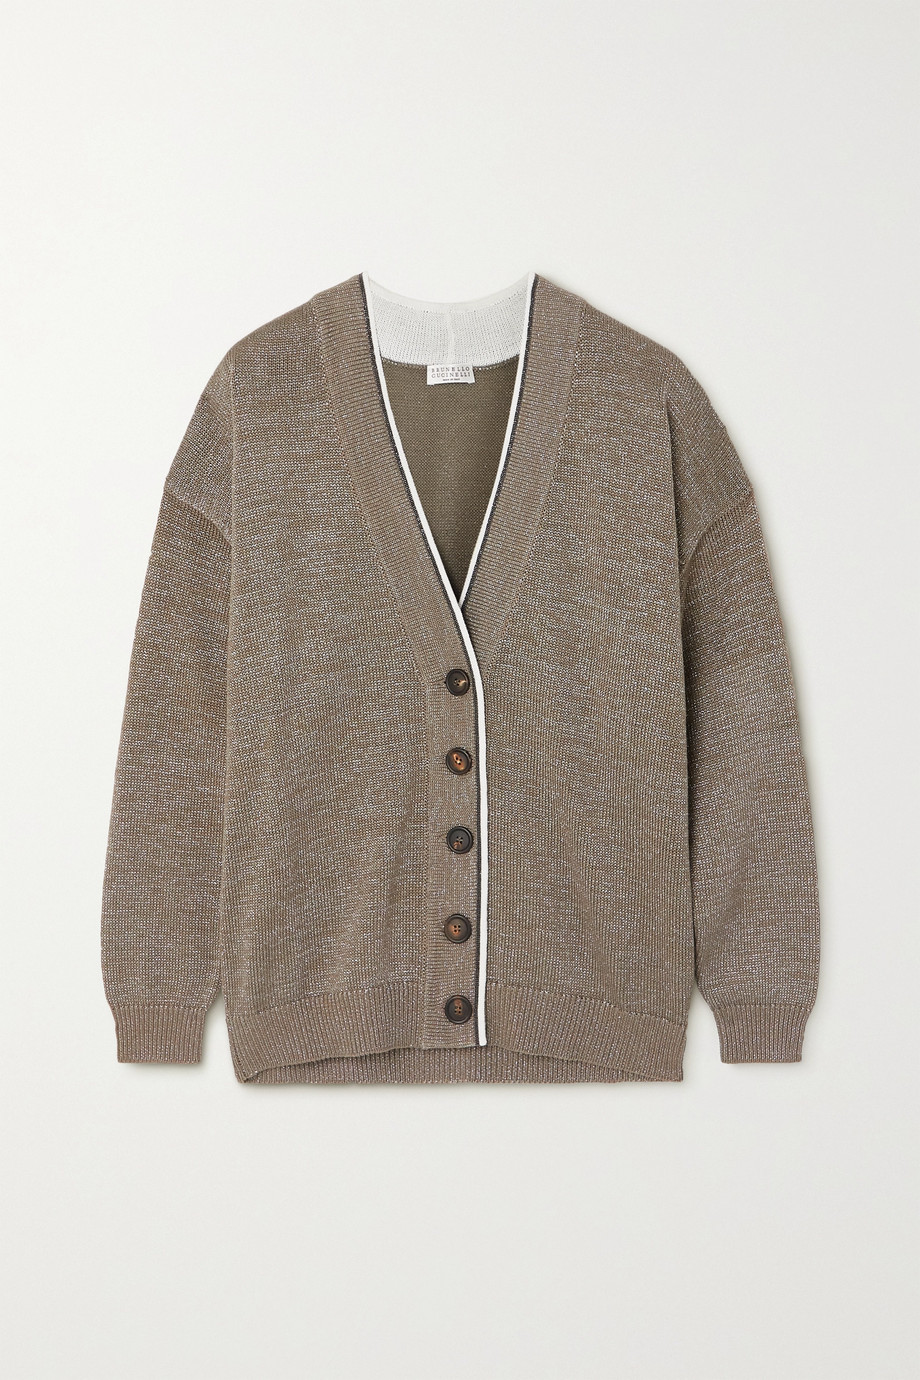 Brunello Cucinelli Bead-embellished metallic cotton-blend cardigan